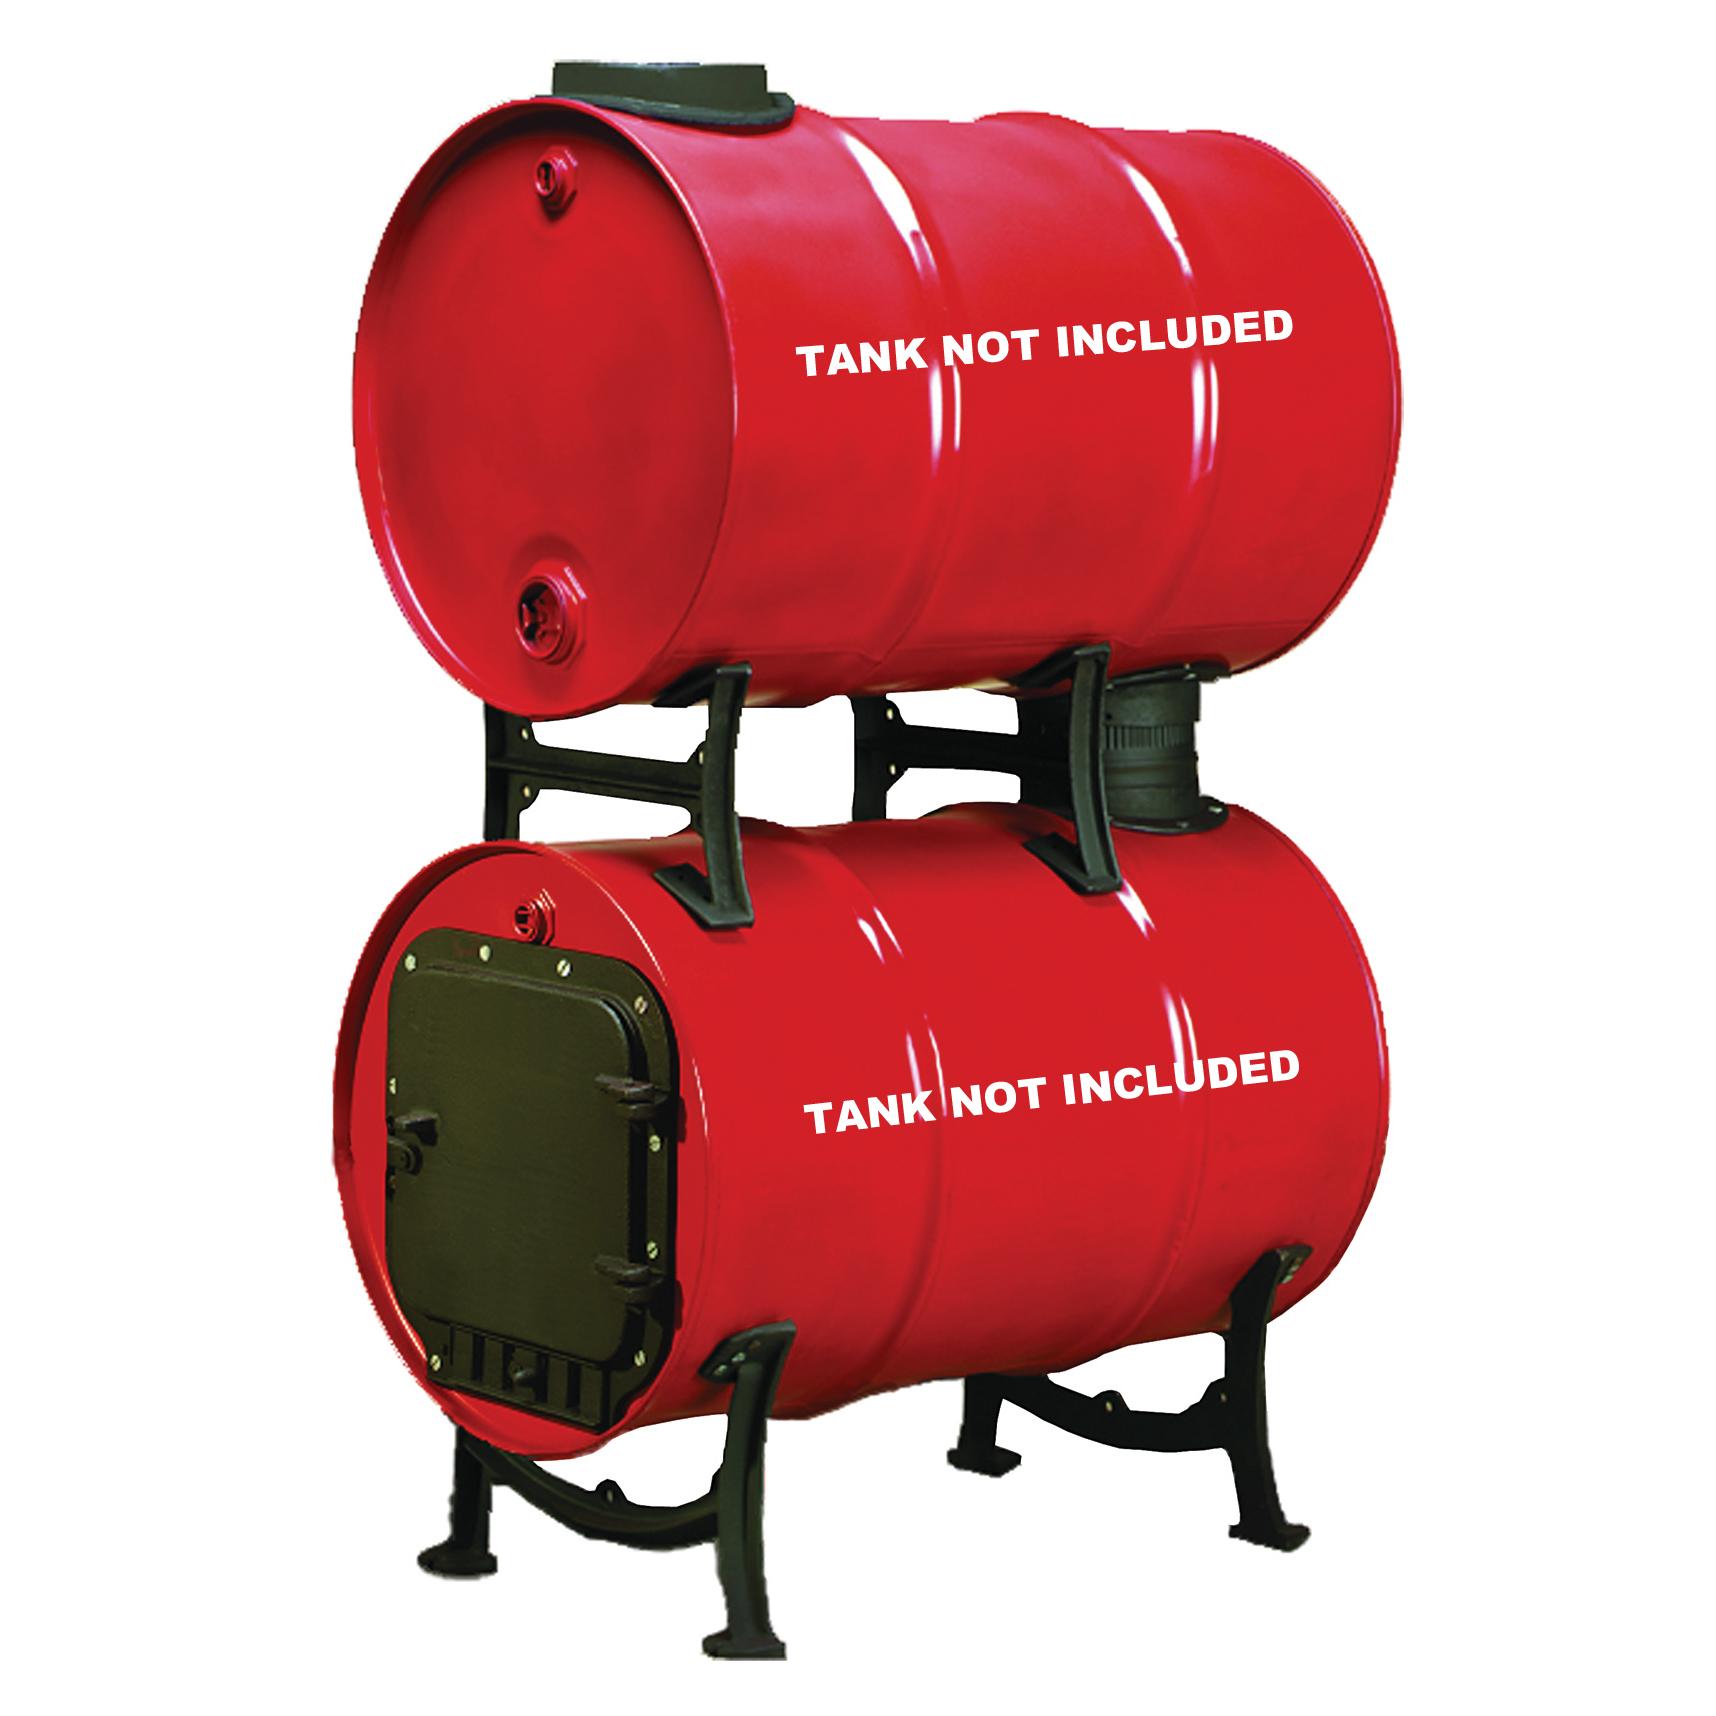 United States Stove Company BKAD500 Double Barrel Adapter Kit